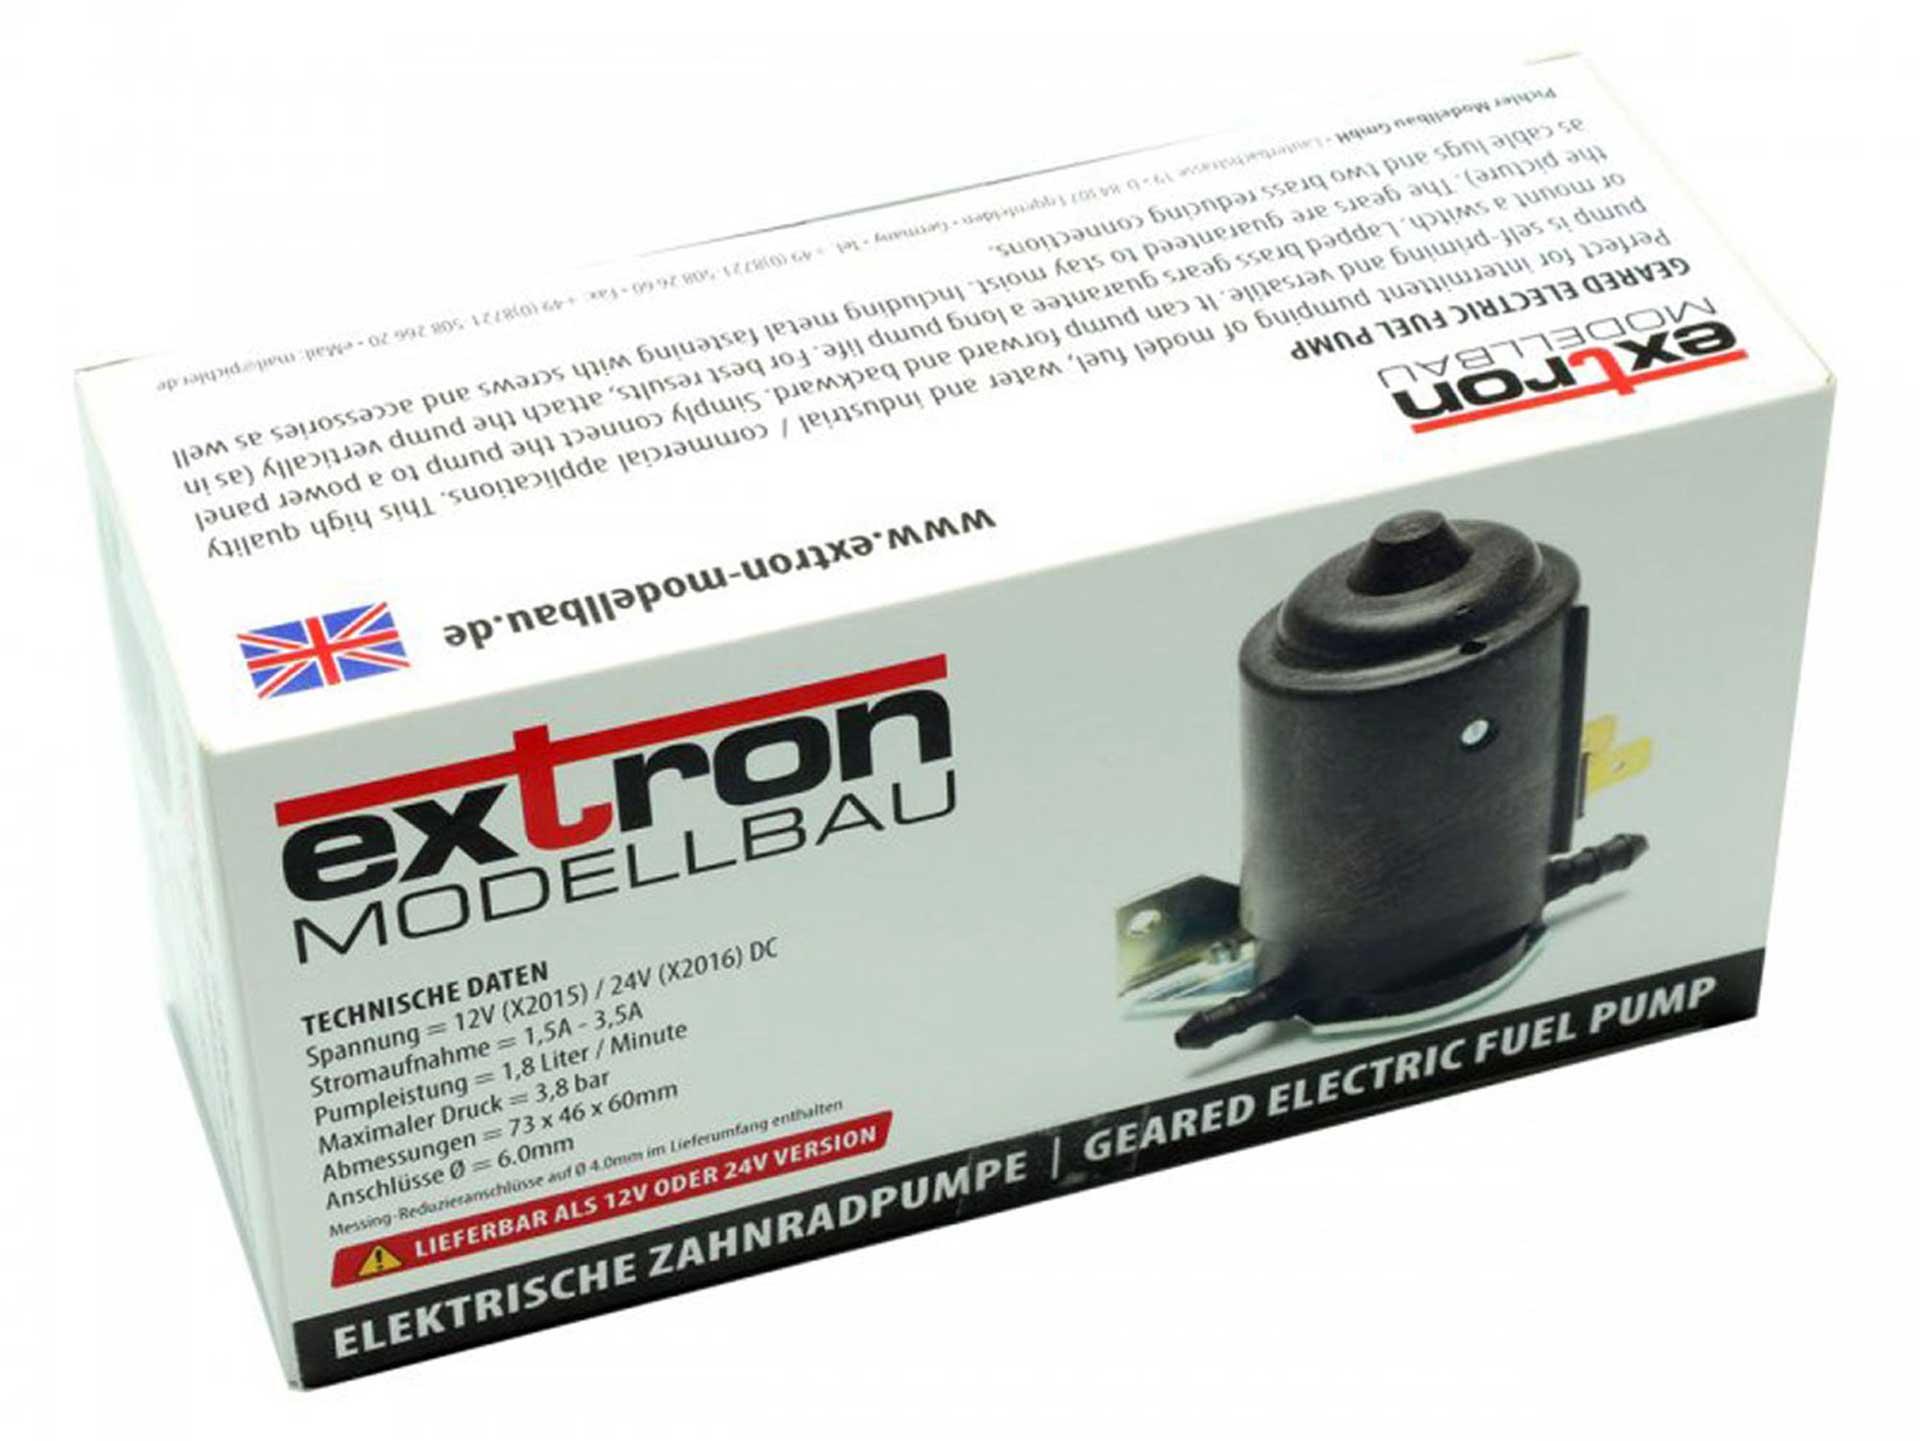 EXTRON ELECTRIC GEAR PUMP 24V